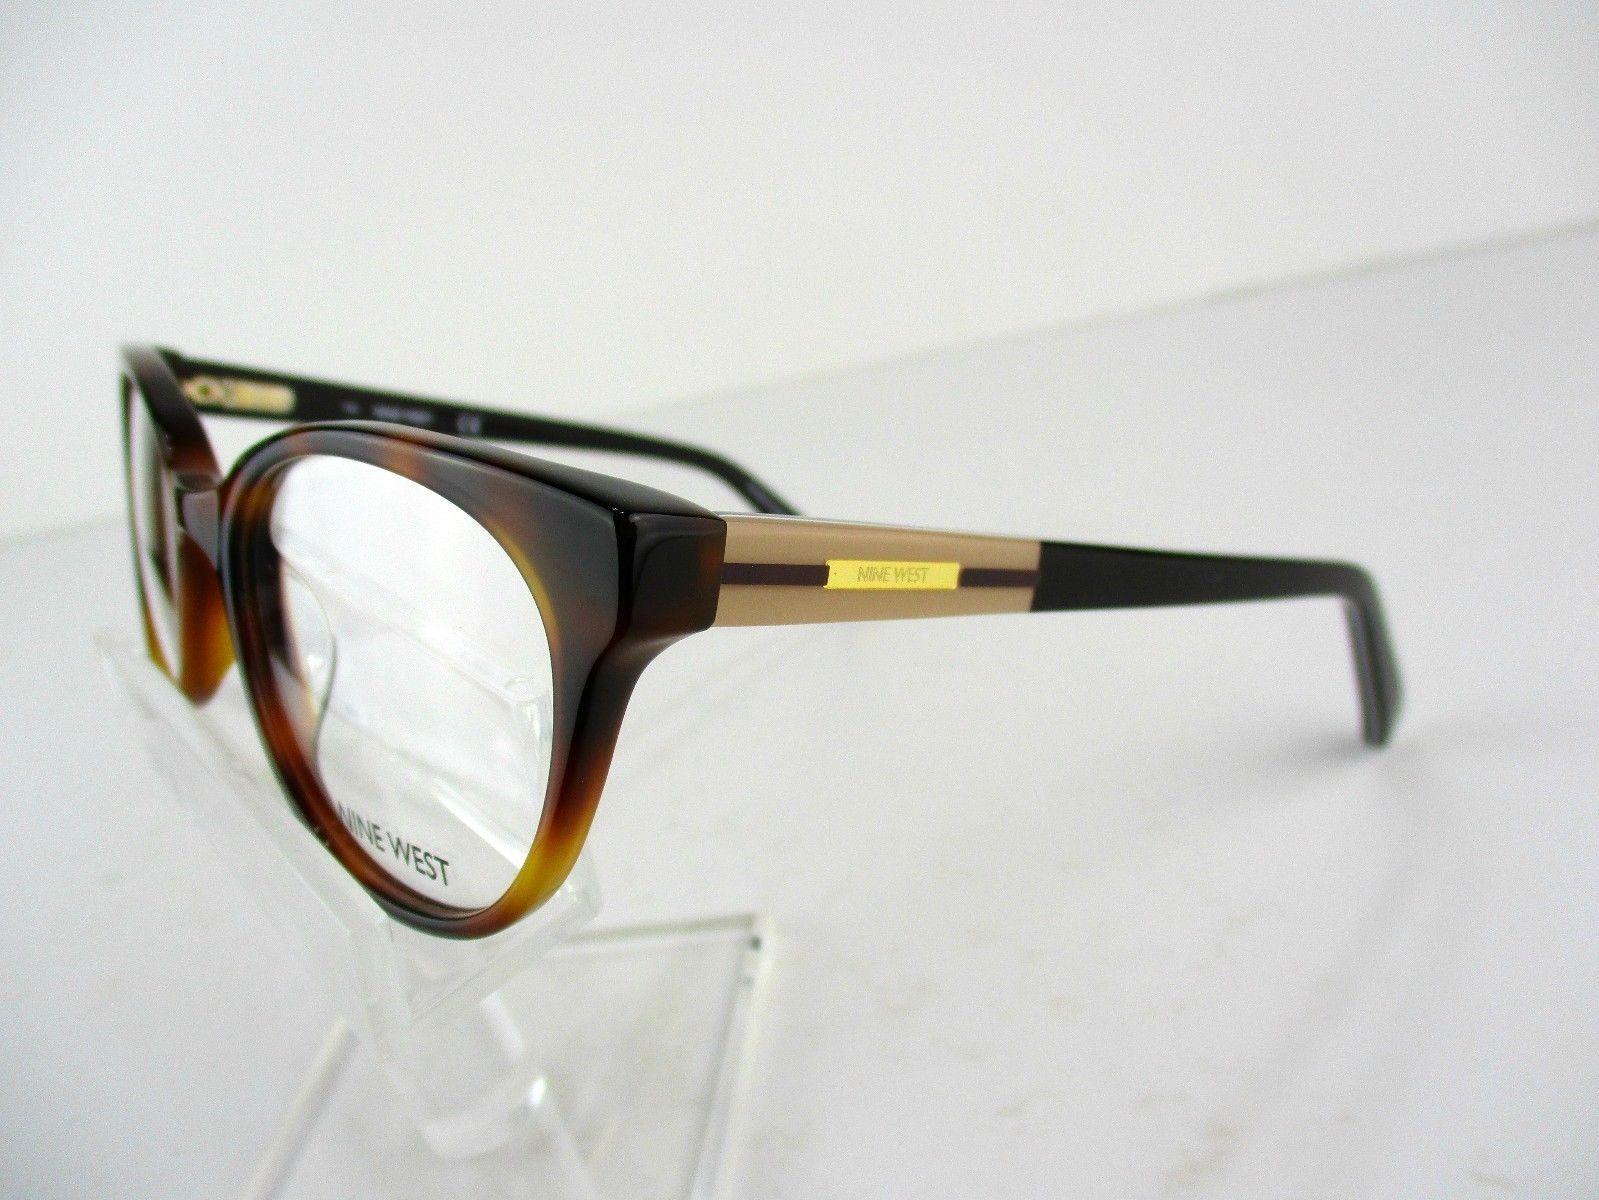 12d11c7b24 Nine West NW 5135 (218) Soft Tortoise 49 x 17 135 mm Eyeglass Frames